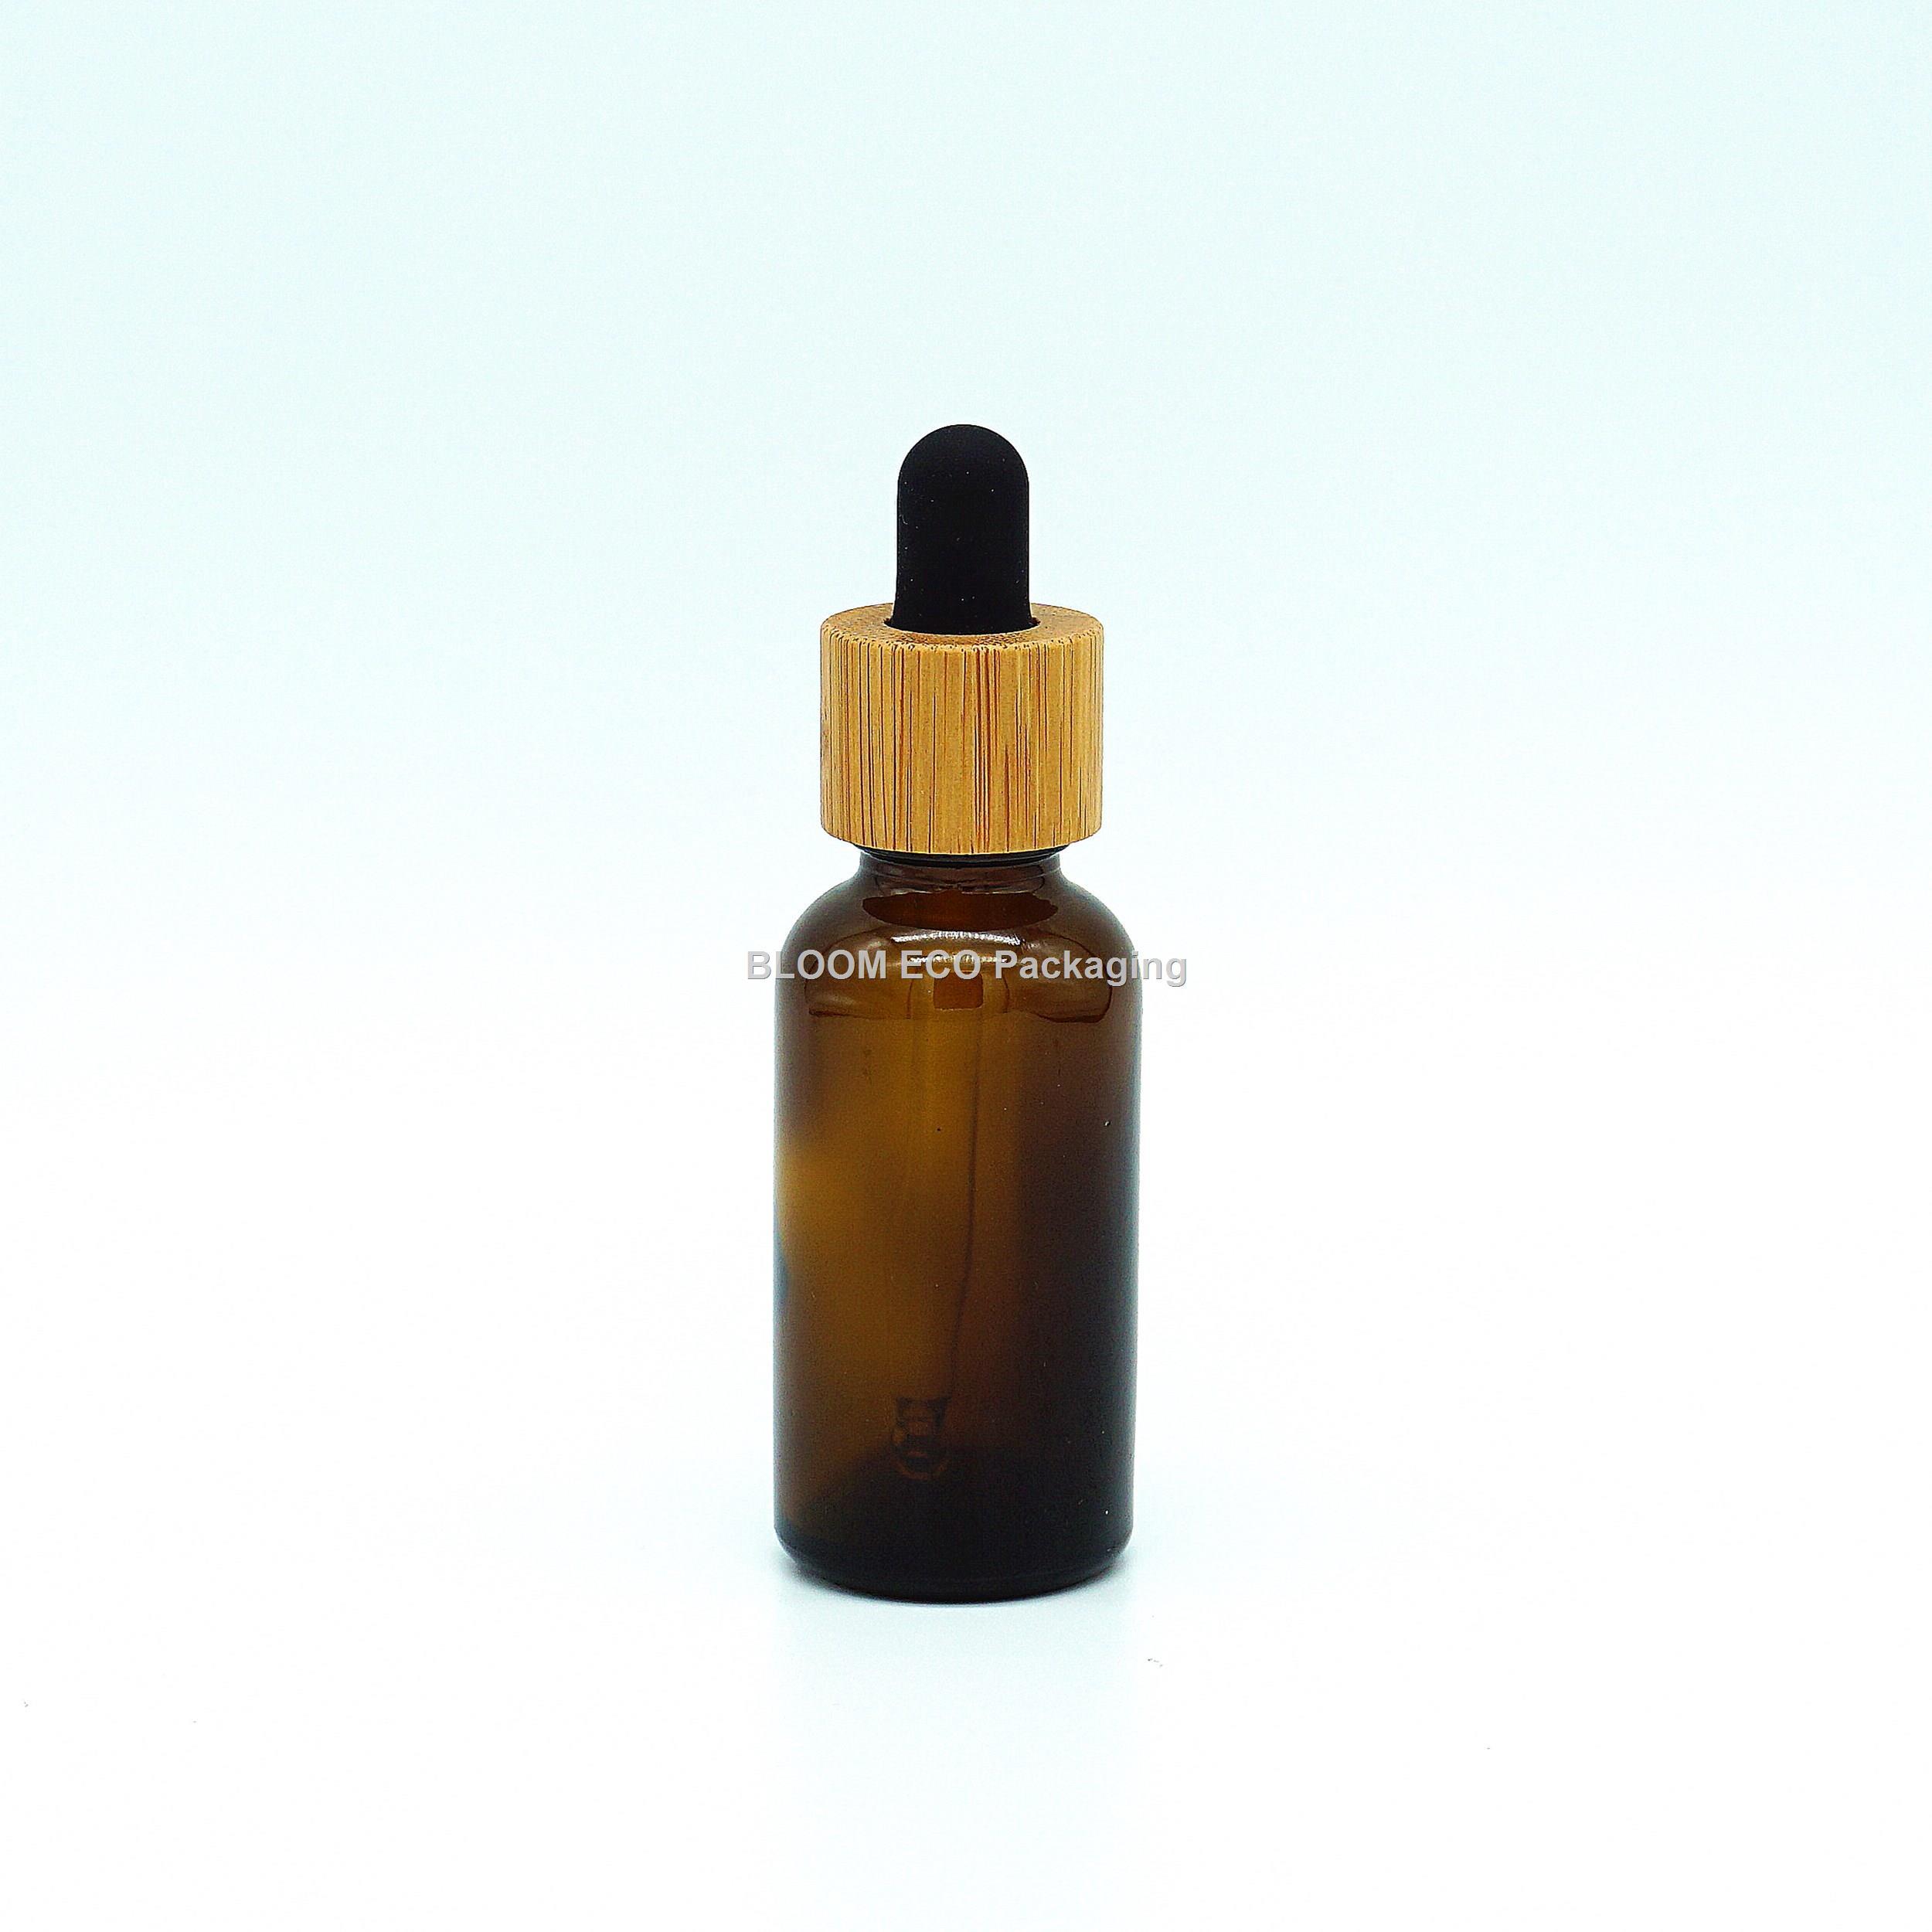 Glass Bamboo Dropper Bottle DT2001